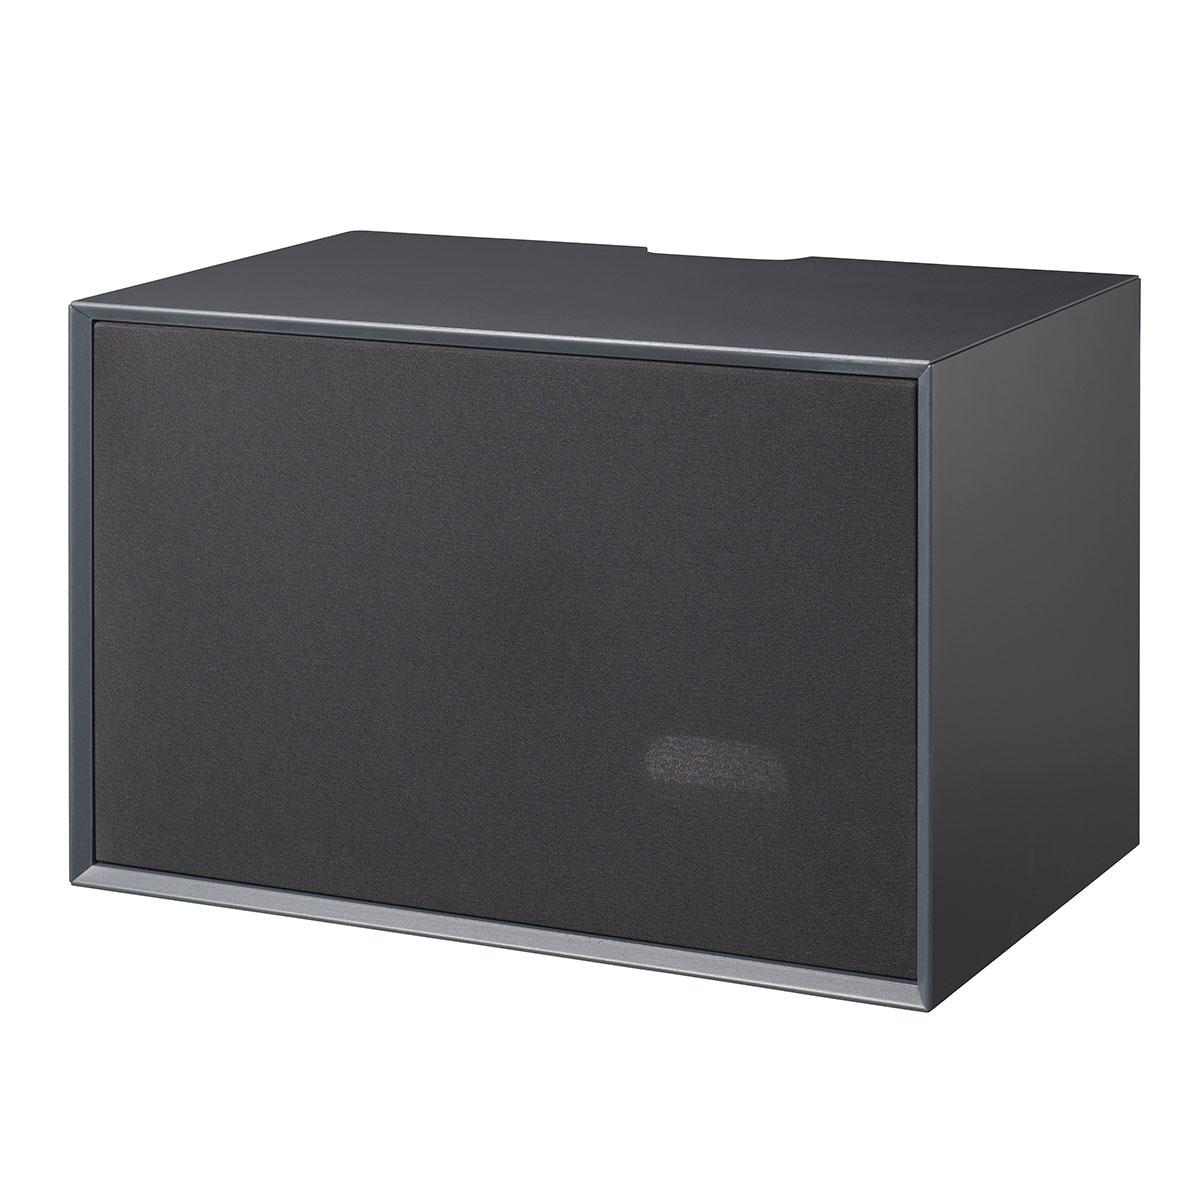 Image of   Living&more skab med stoflåge - The Box - 37 x 58 x 34 cm - Antracit